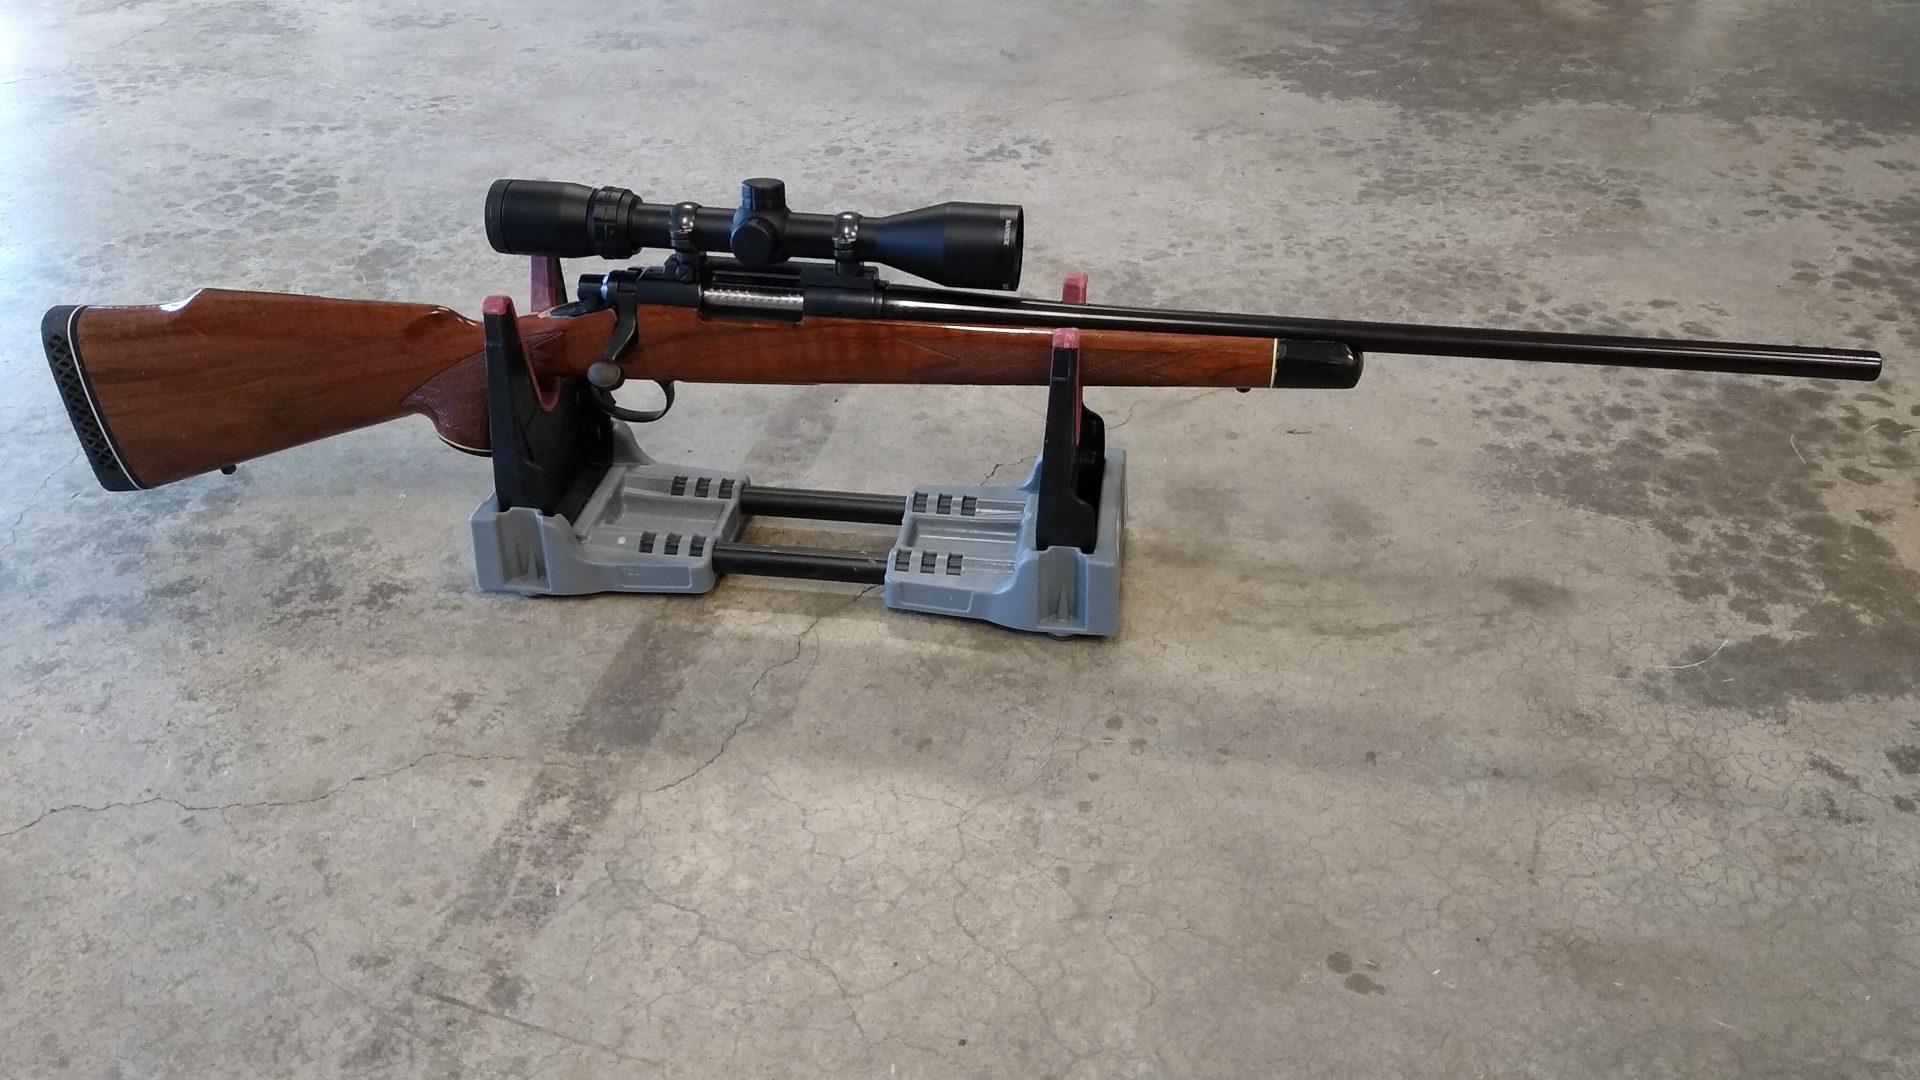 Remington model 700 with scope